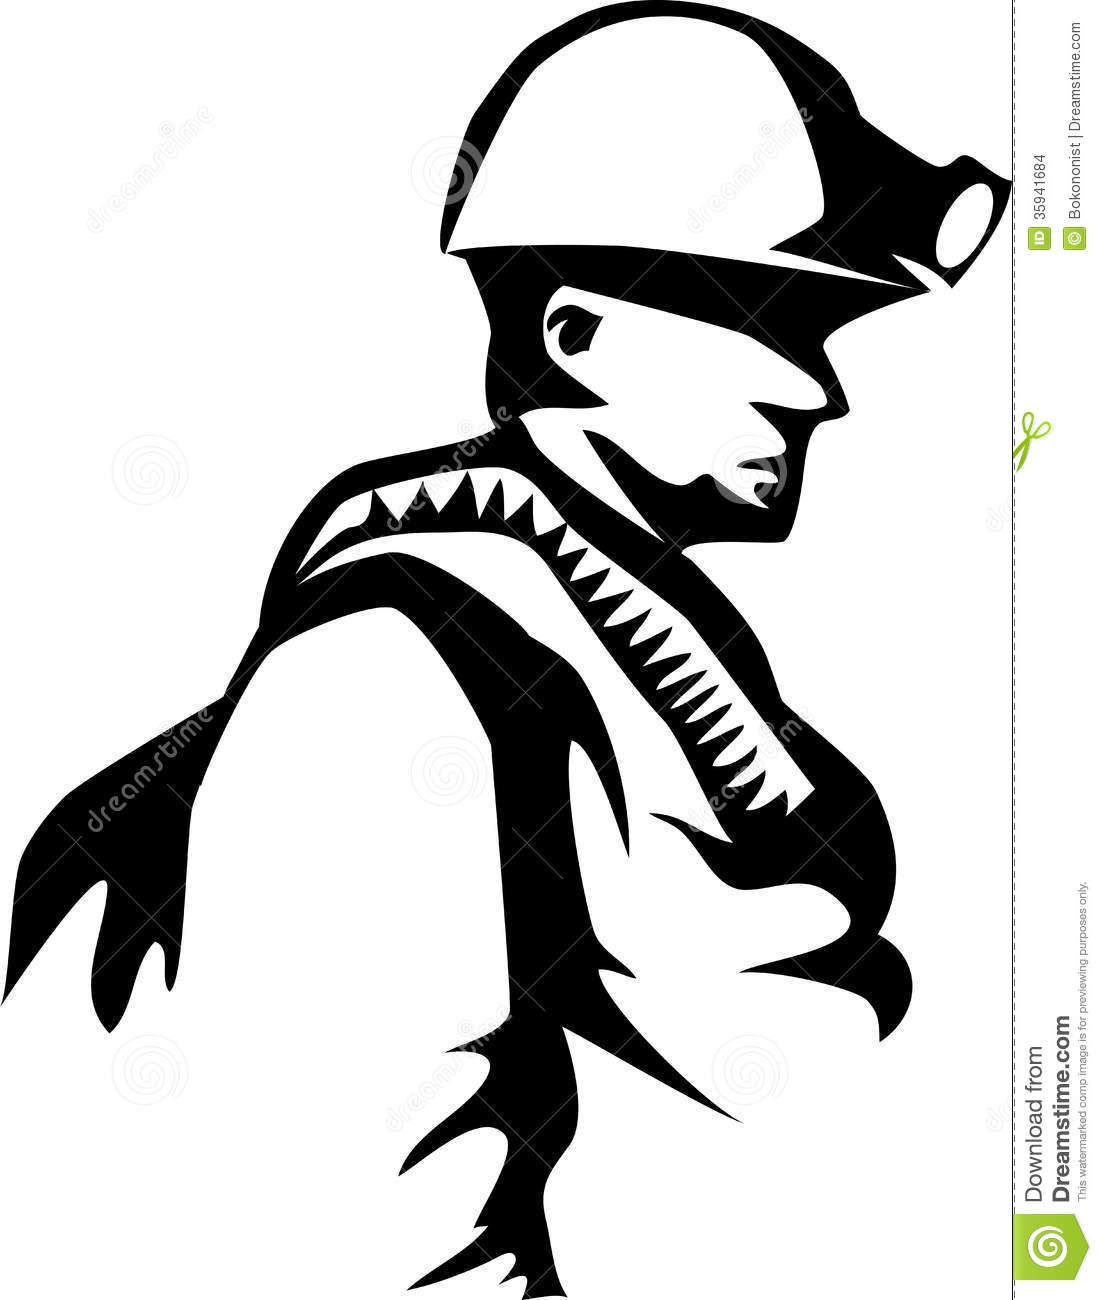 Miner Clipart Miner-Miner Clipart Miner-18